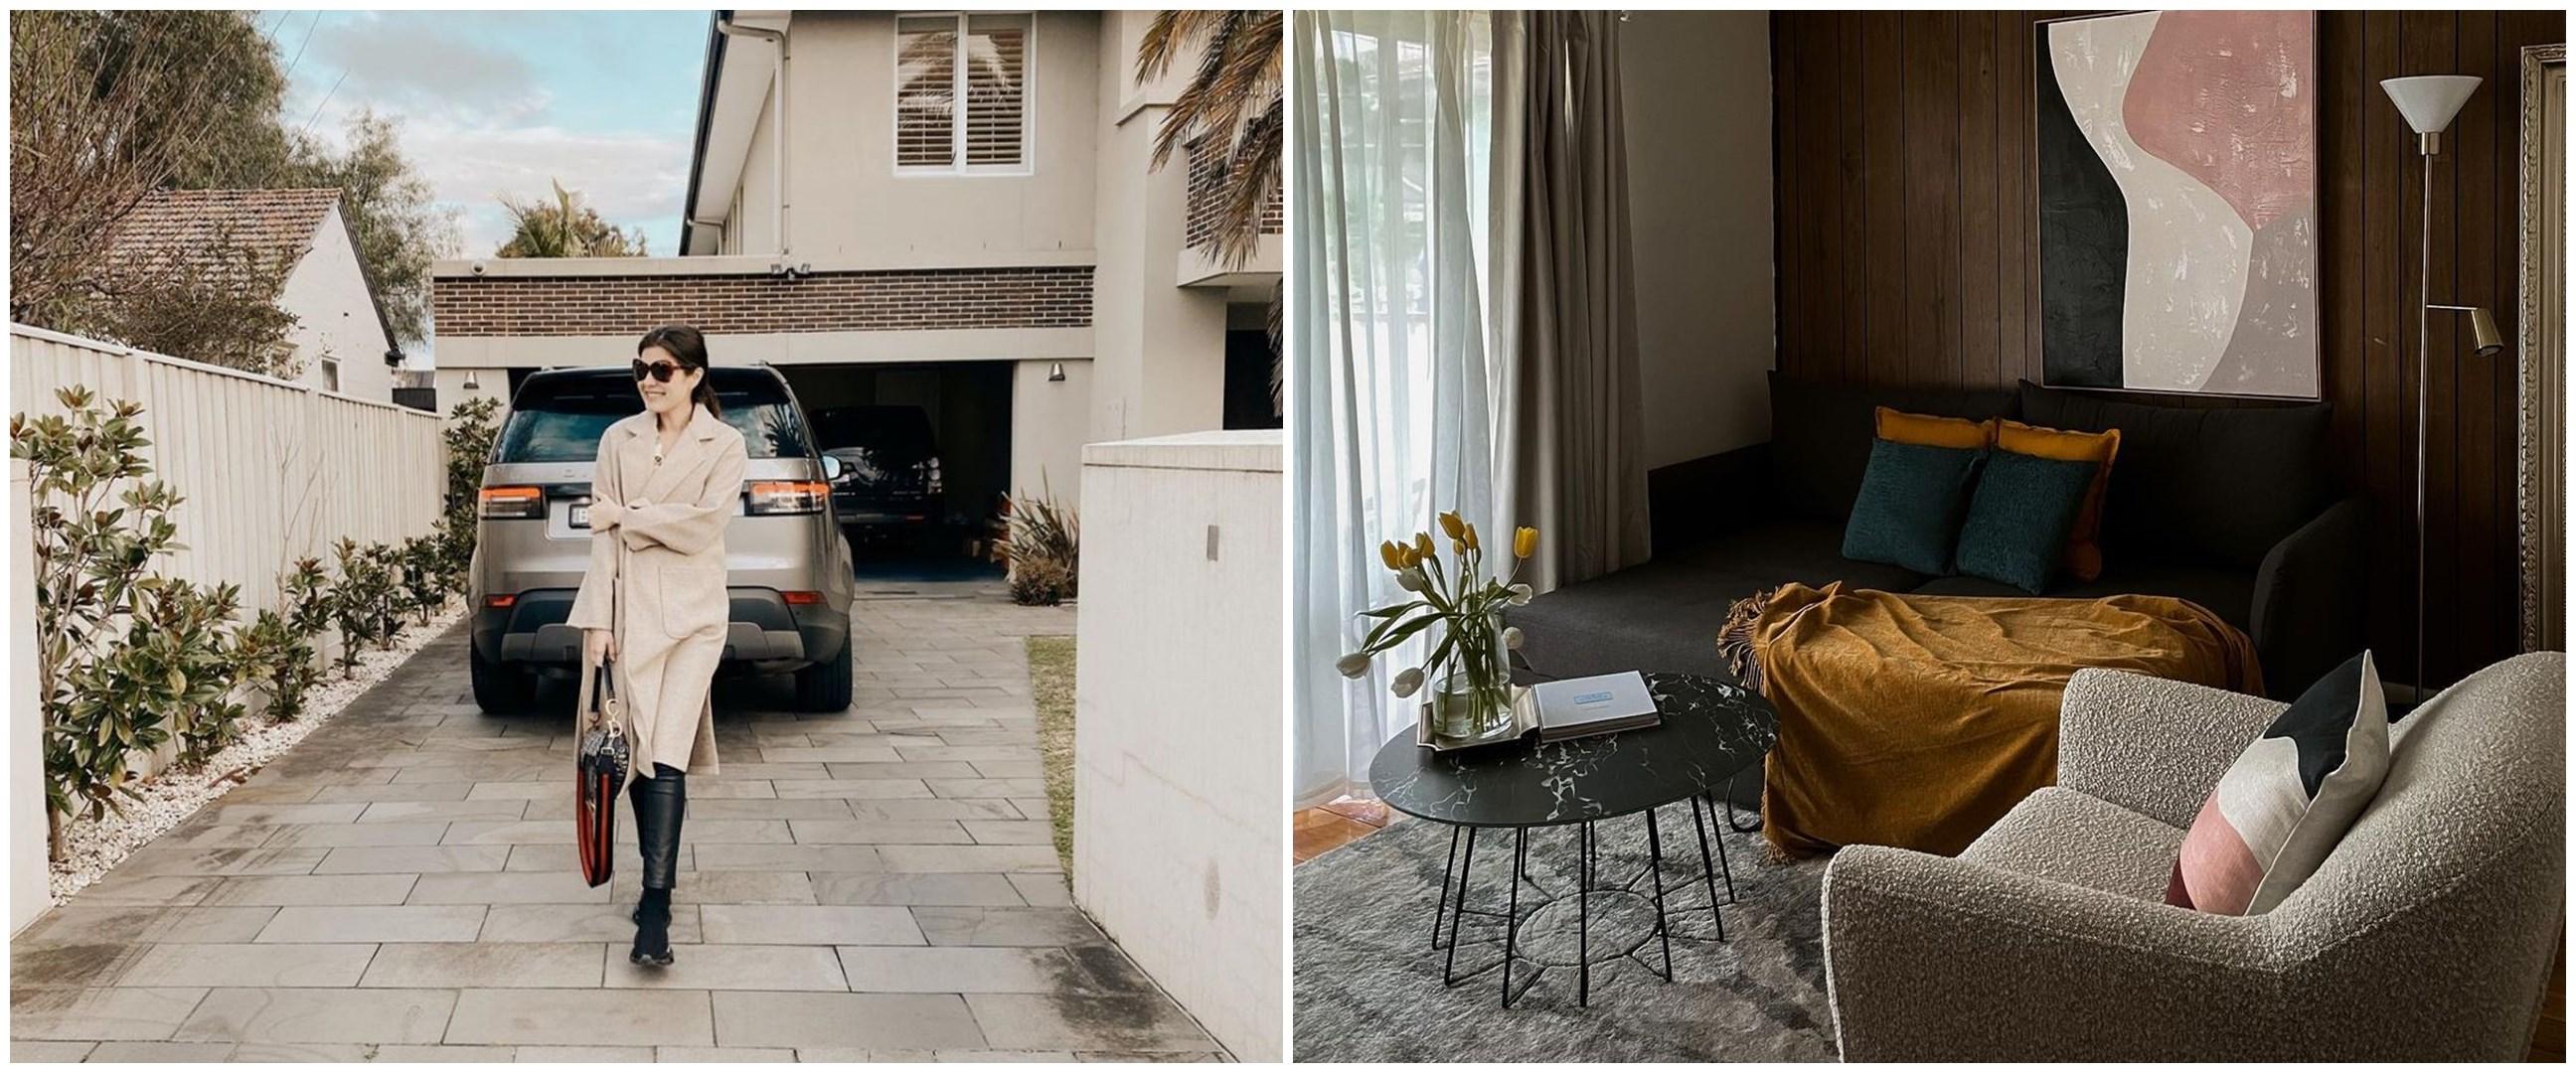 Potret rumah 9 seleb Tanah Air di Australia, simpel dan Instagramable